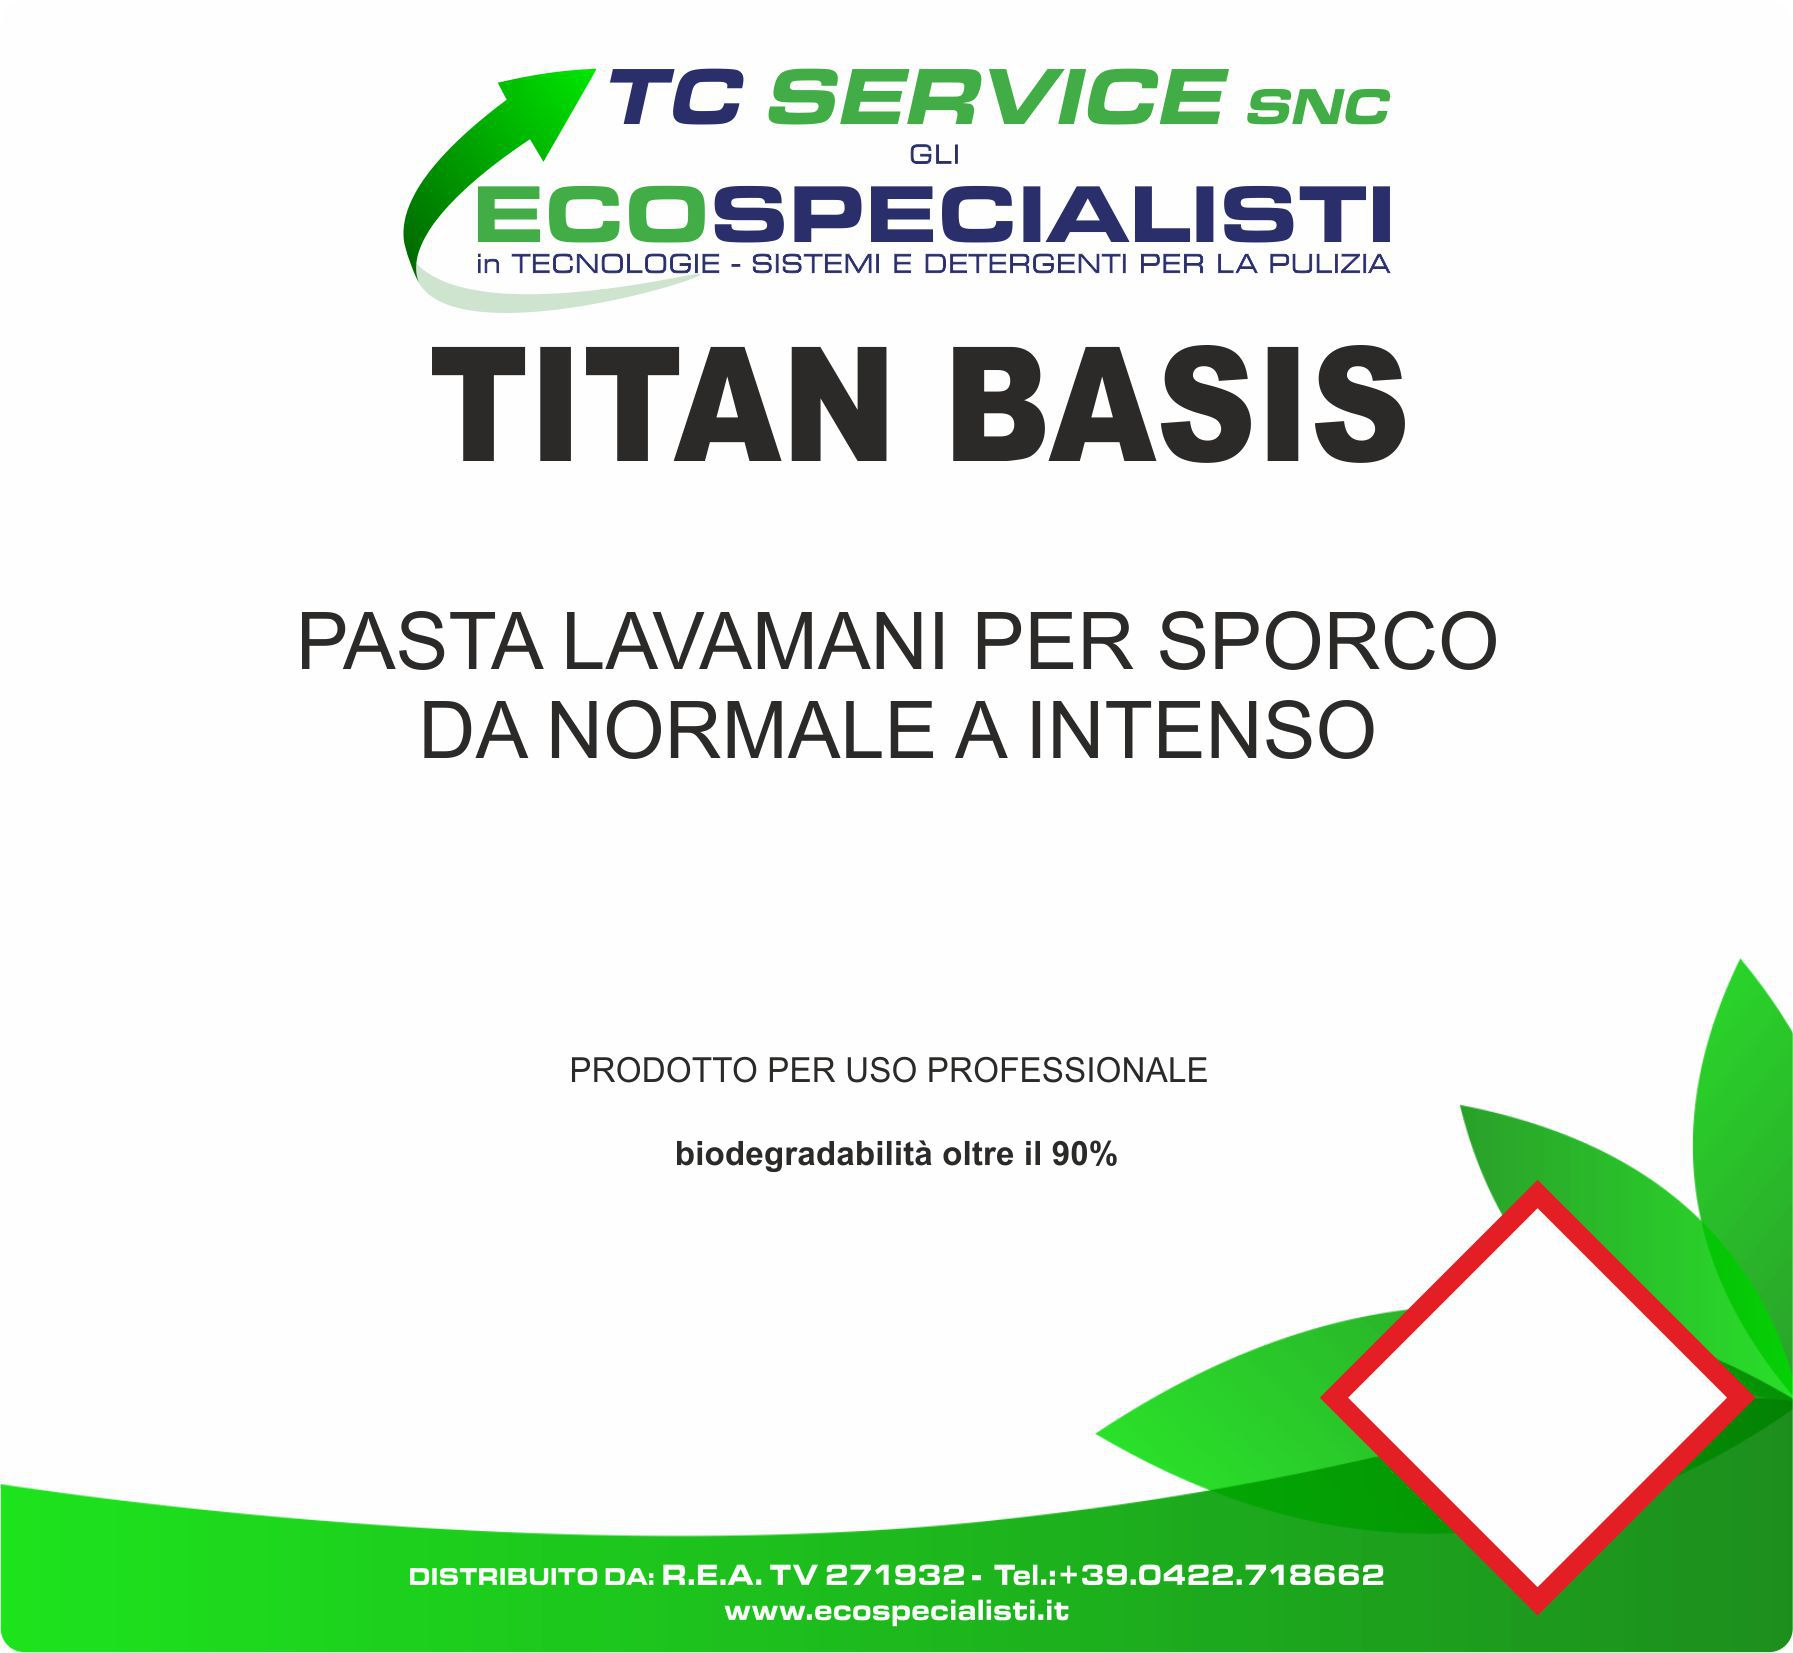 Titan Basis